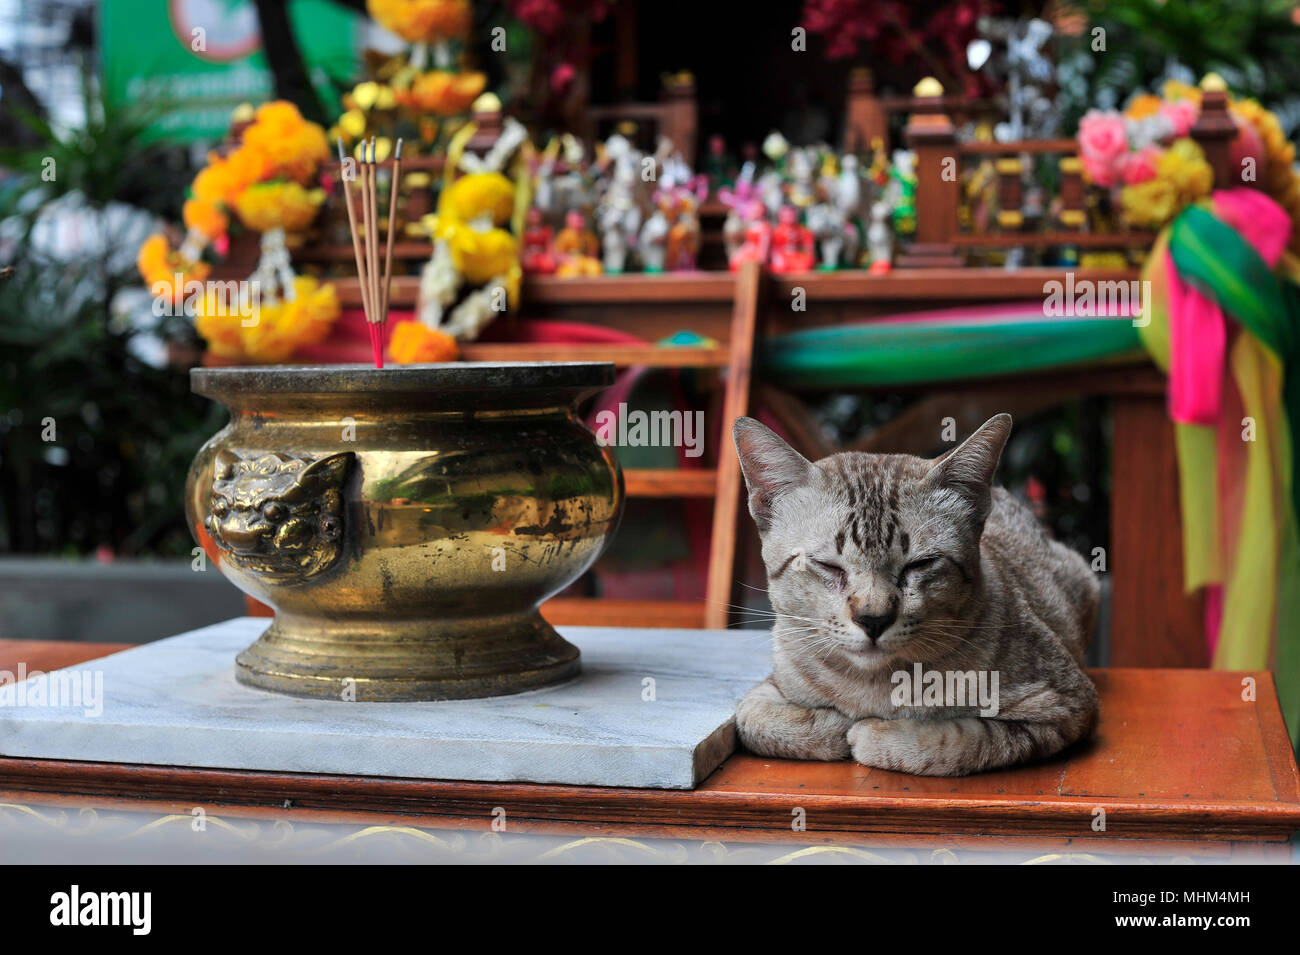 Buddhist Imagery with Grey Cat Pattaya Thailand - Stock Image